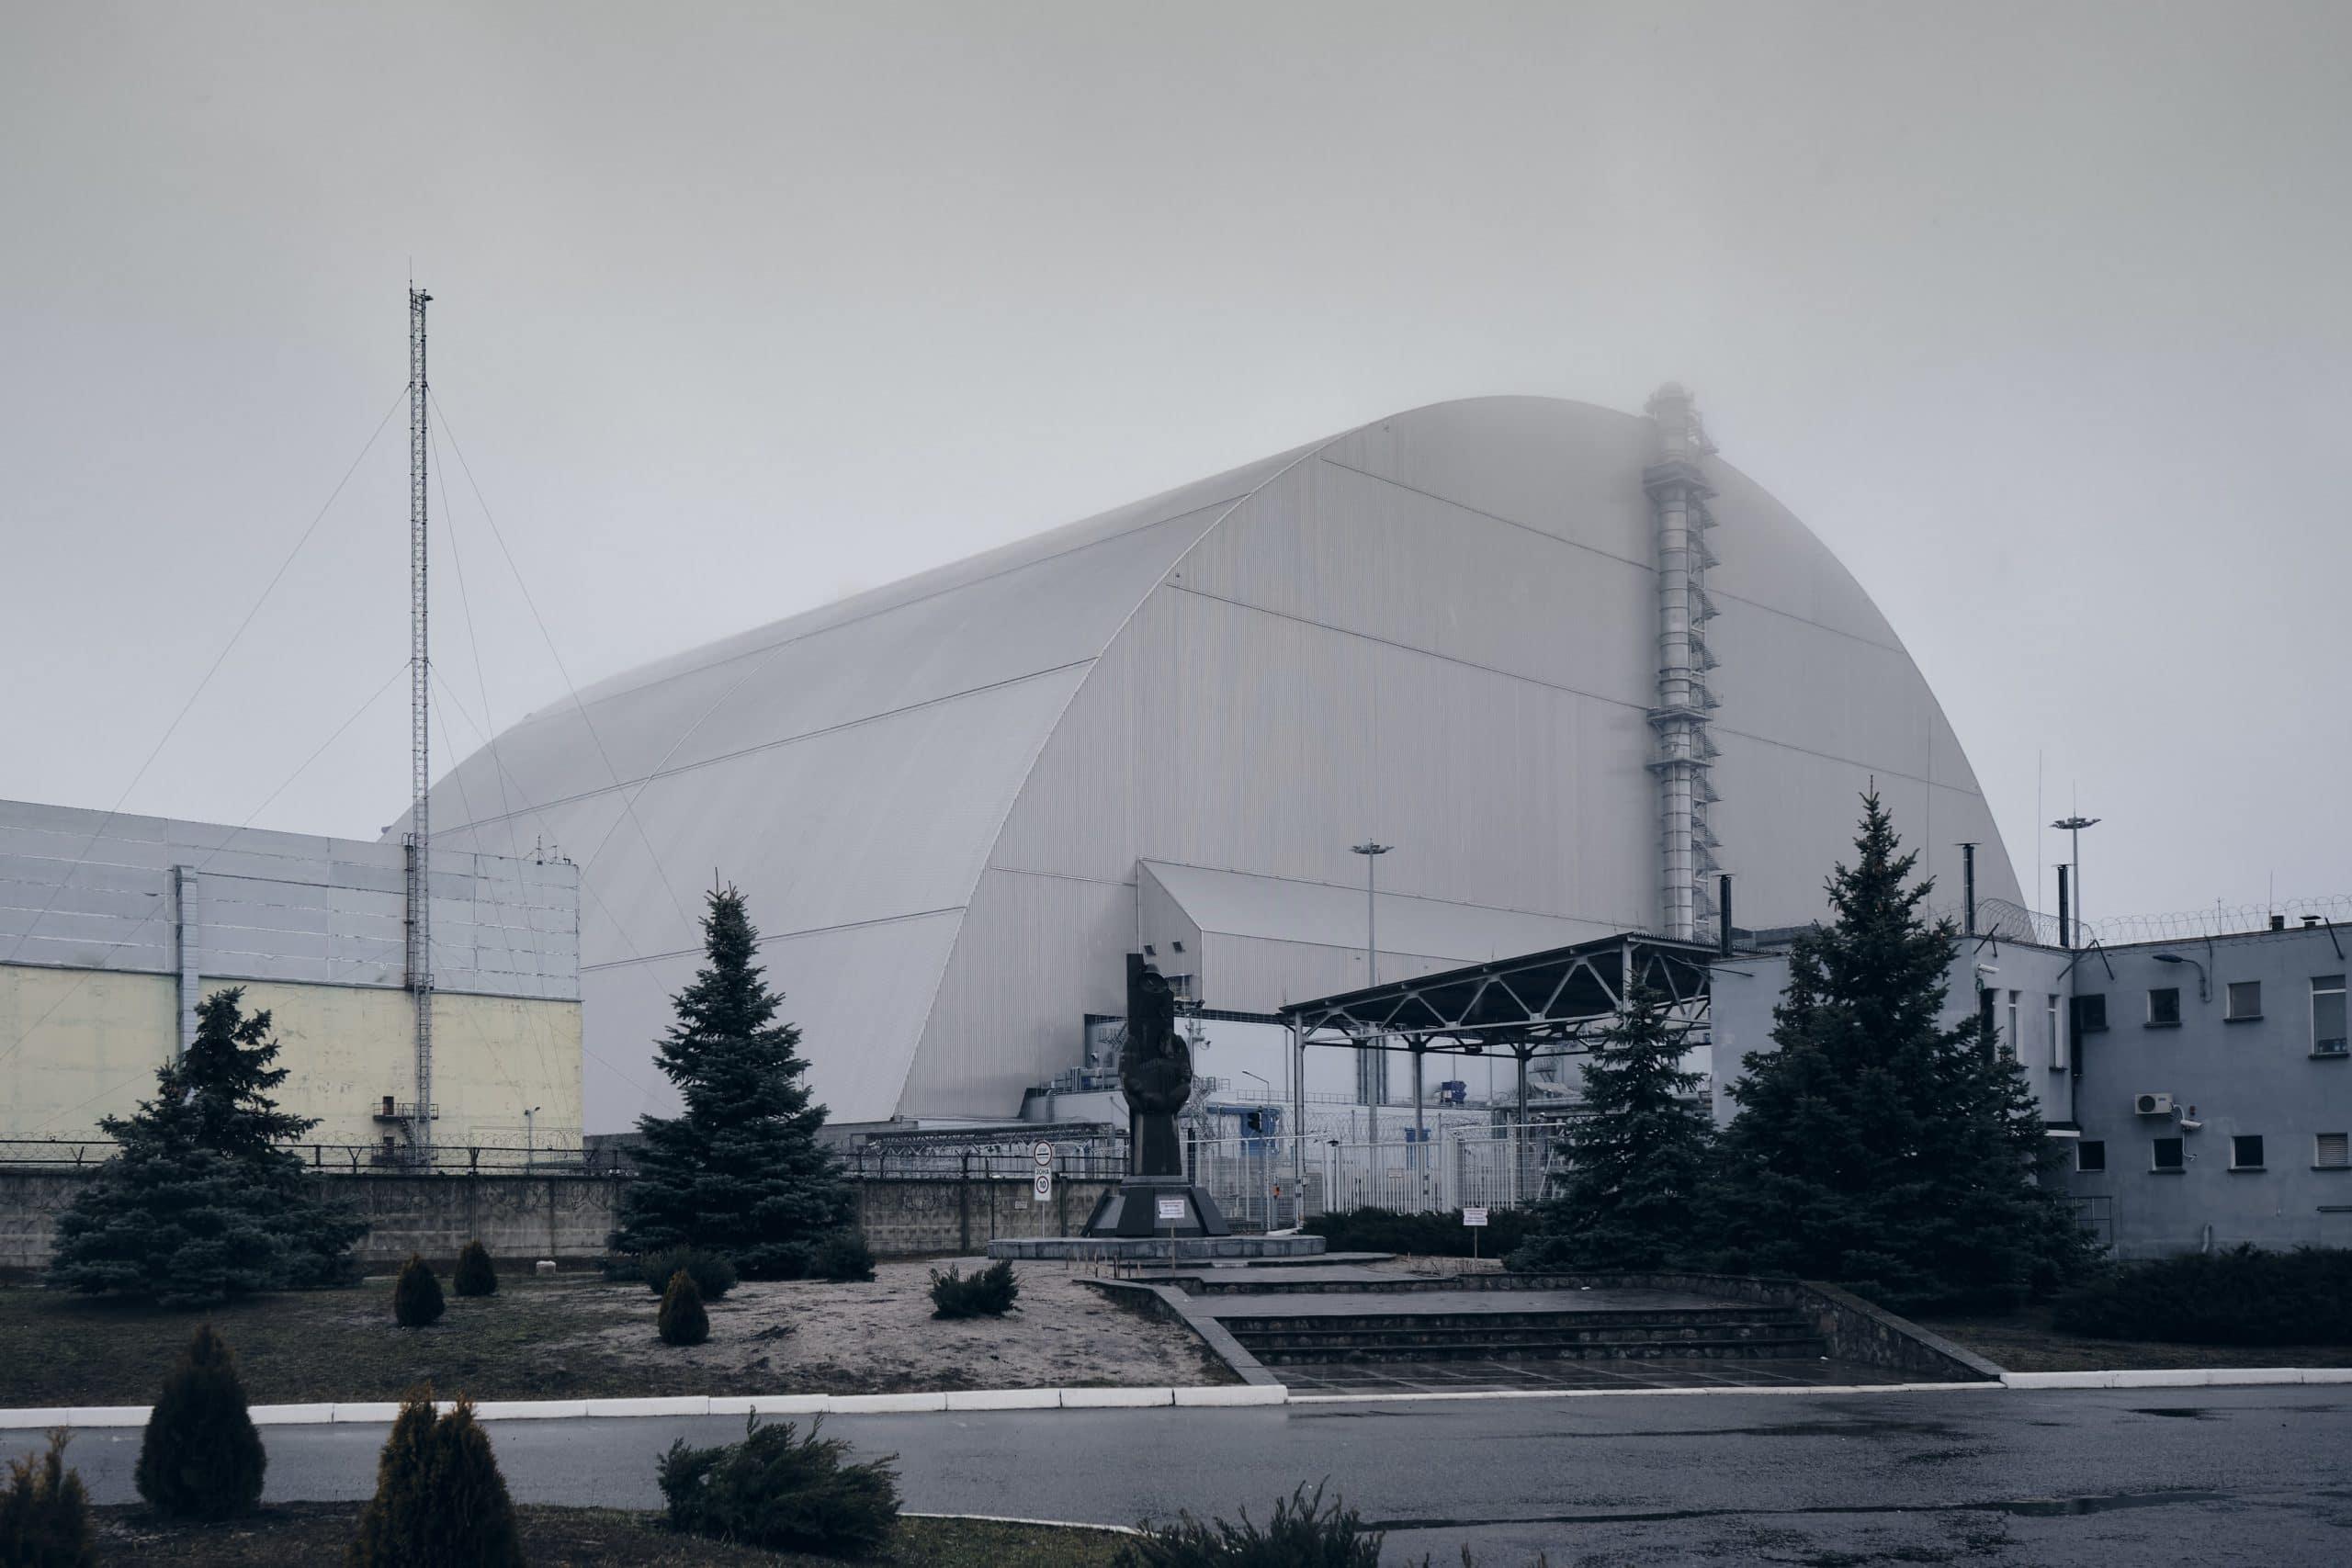 chernobyl torna a fare paura